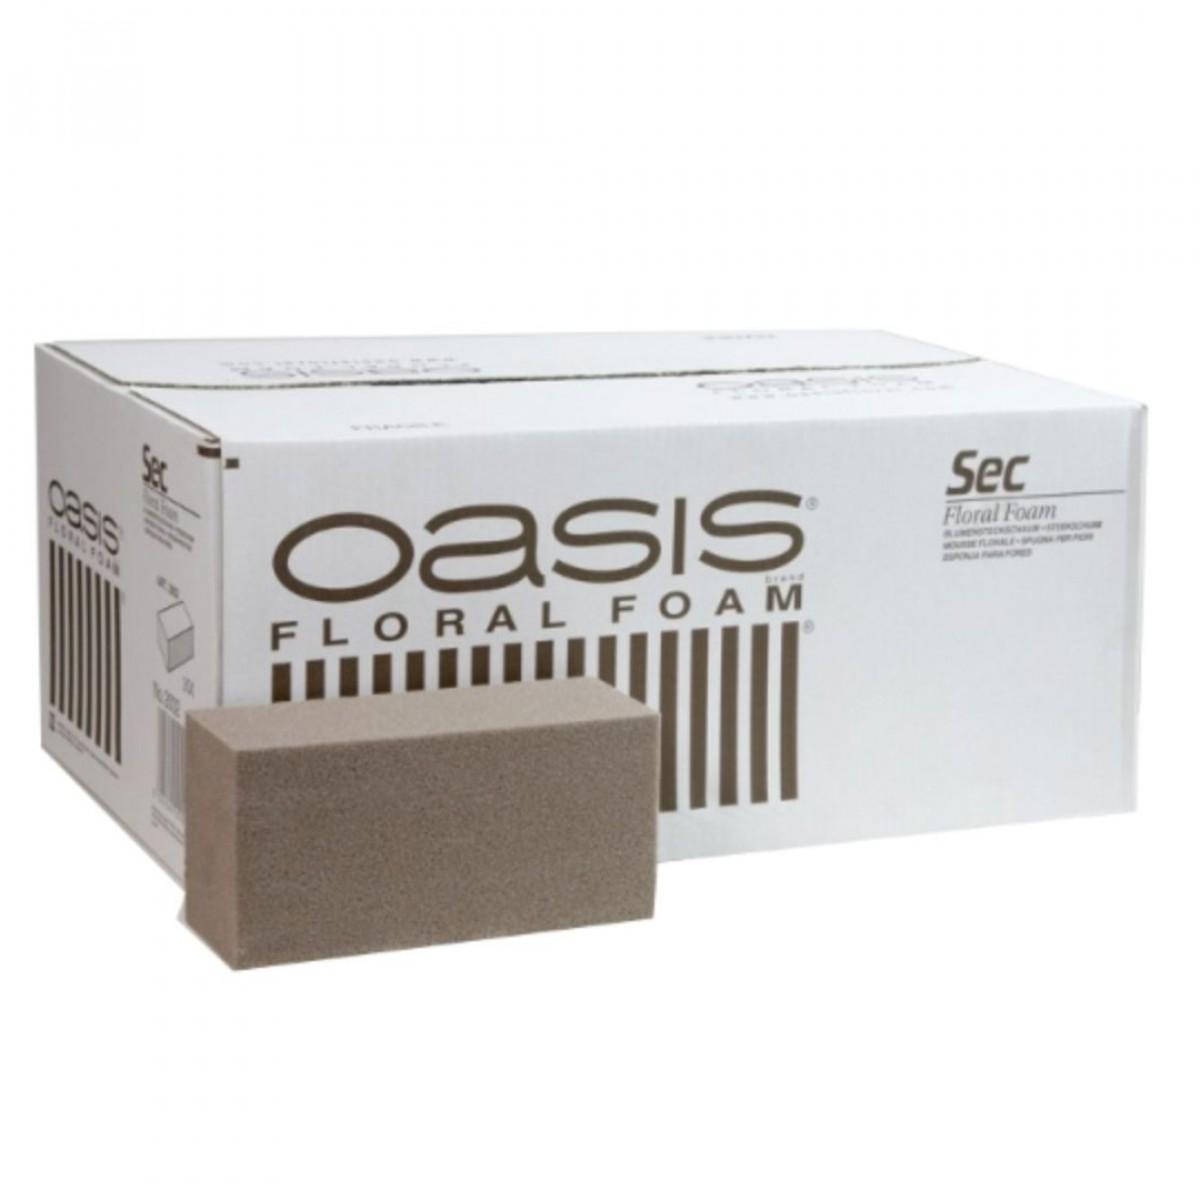 SEC Brick (20 Nos) Dry Oasis Floral Foam